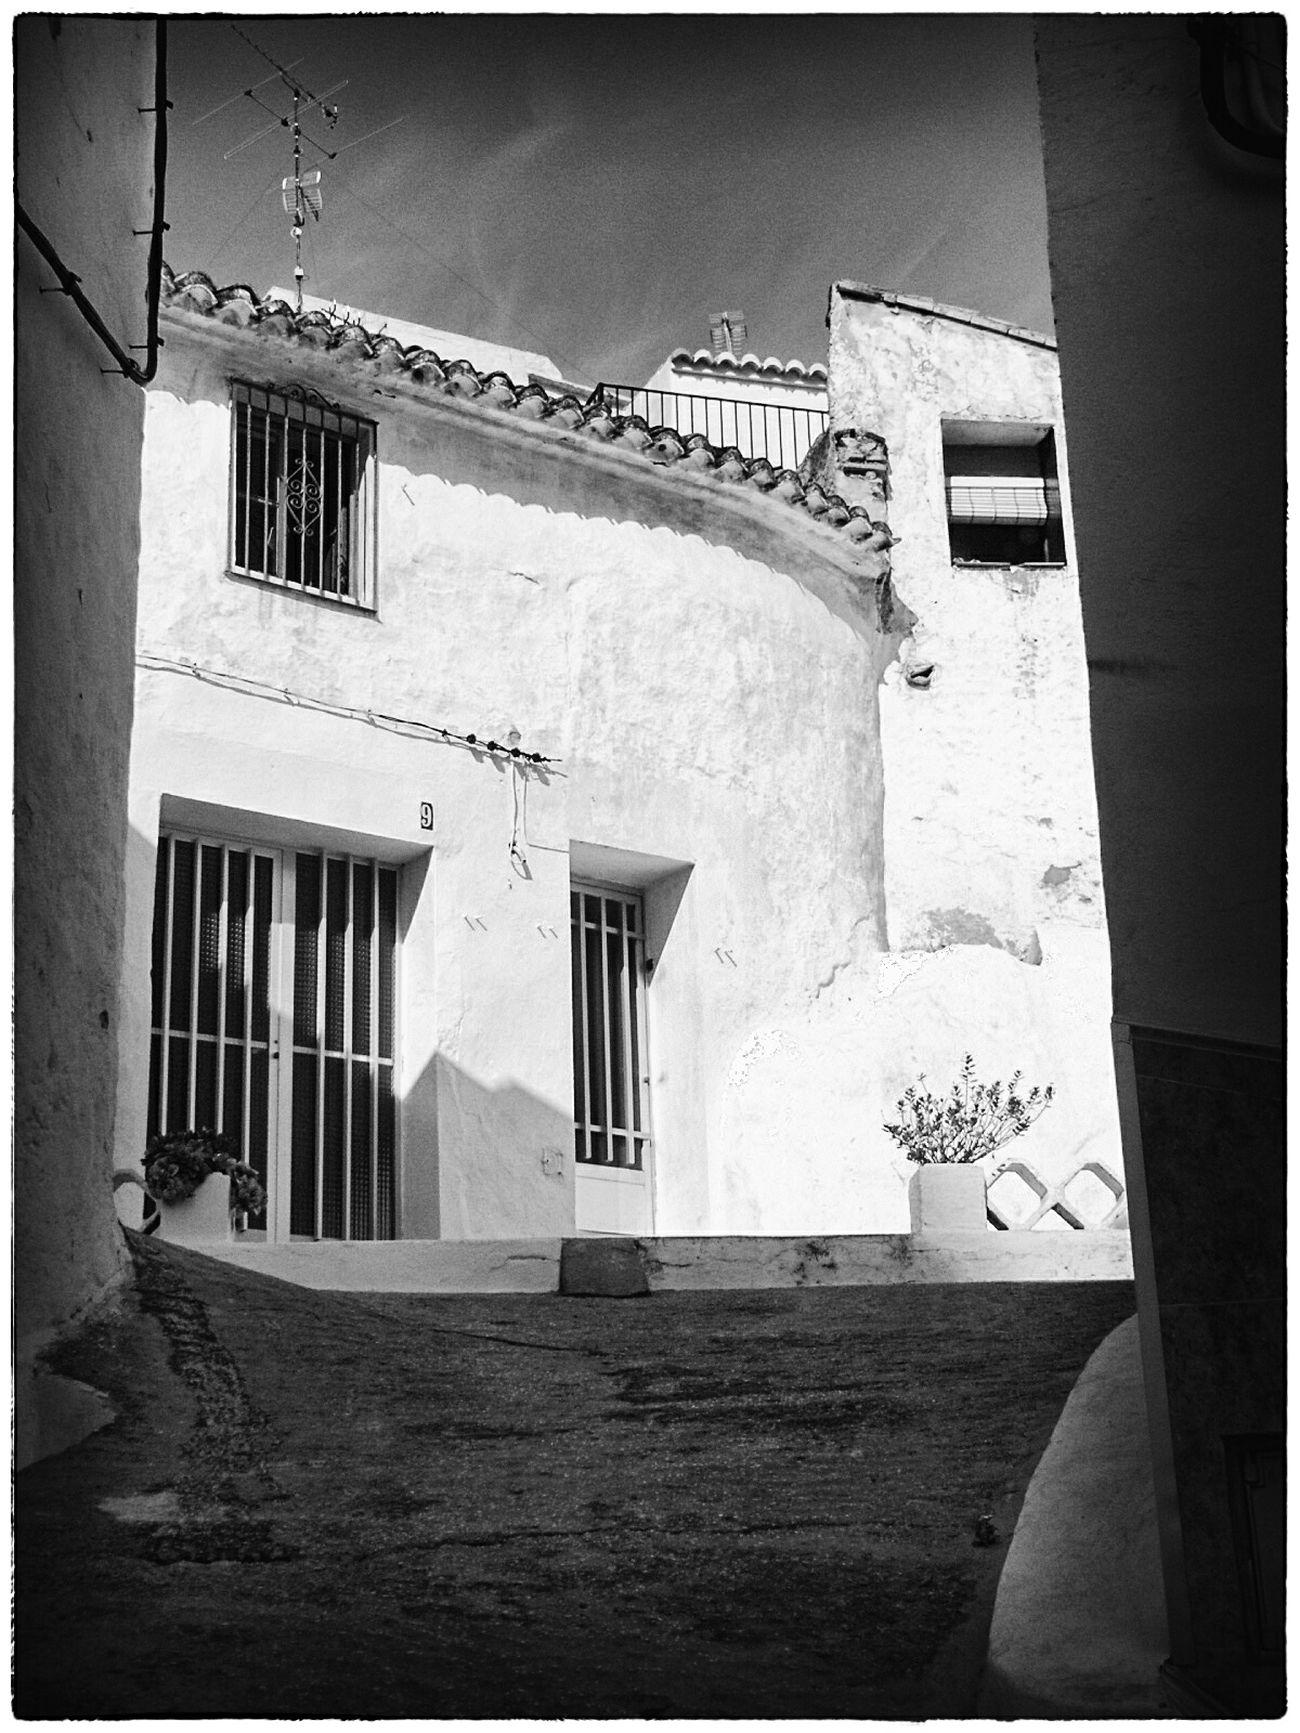 SPAIN Valencia, Spain Cullera Blackandwhitephotography Monochrome Architecture